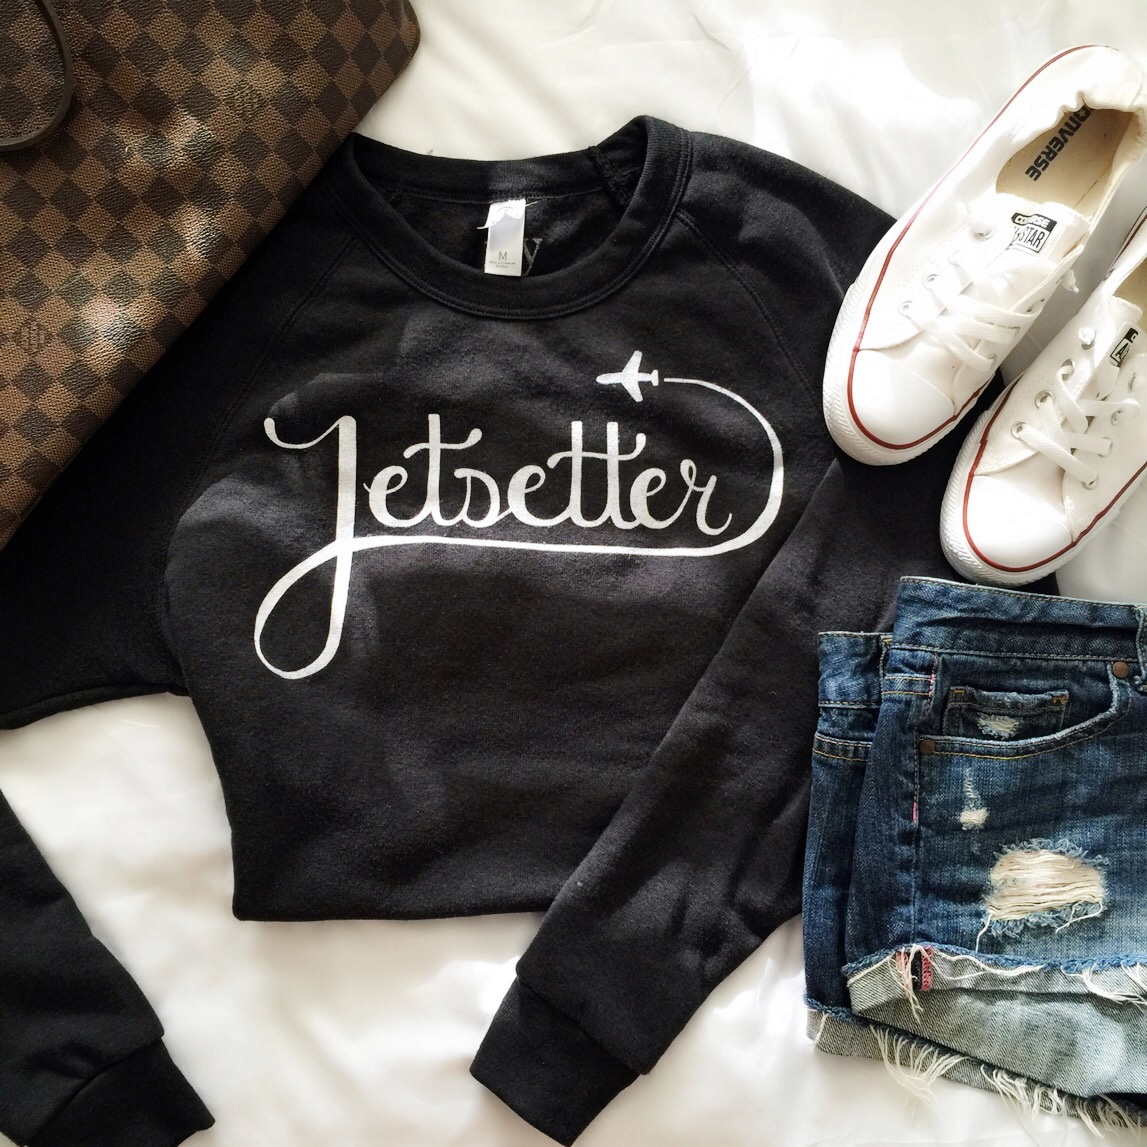 jetsetter sweatshirt, ILY couture